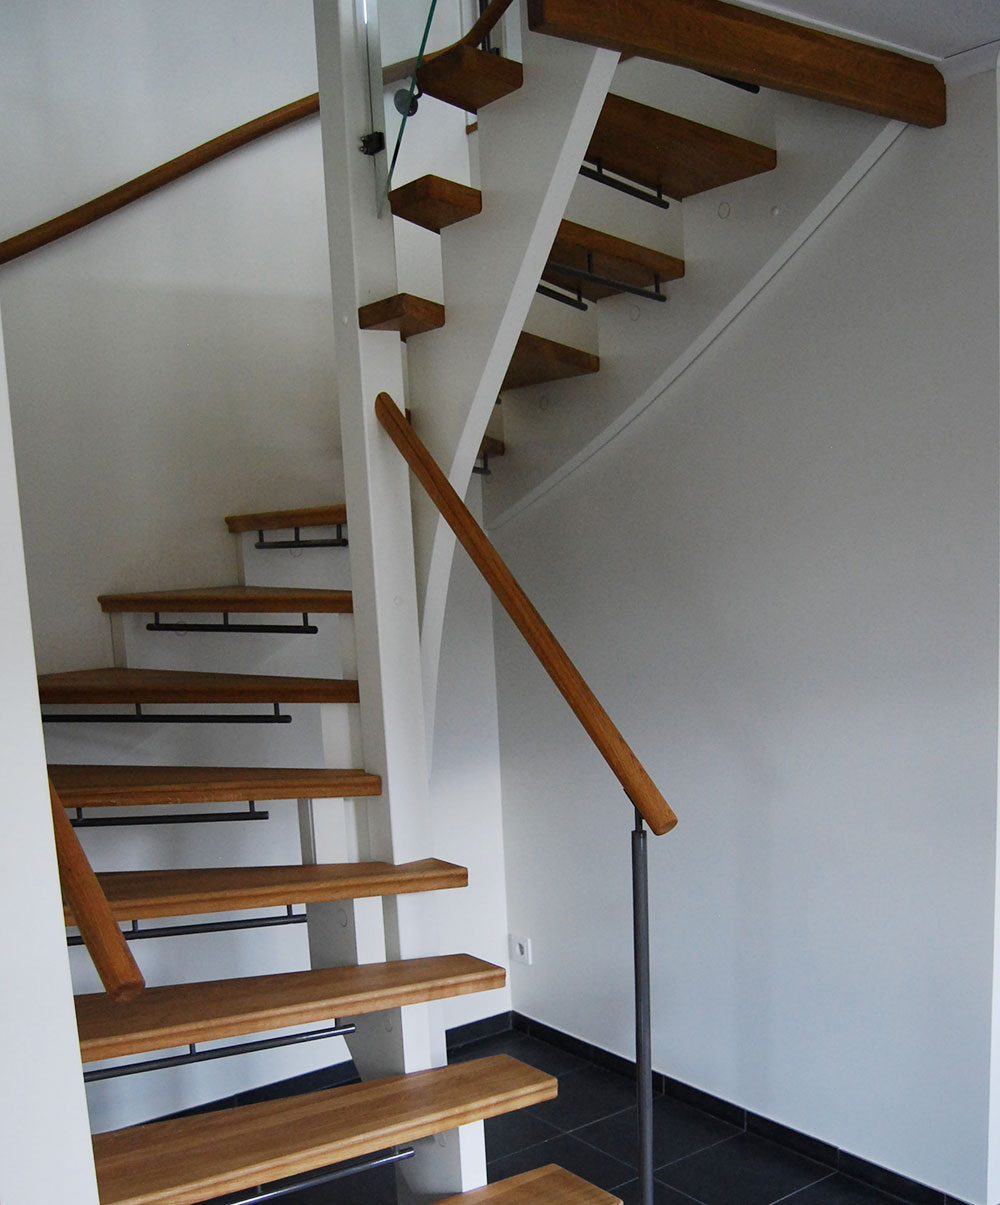 En vit trappa inomhus med trappsteg i ek.